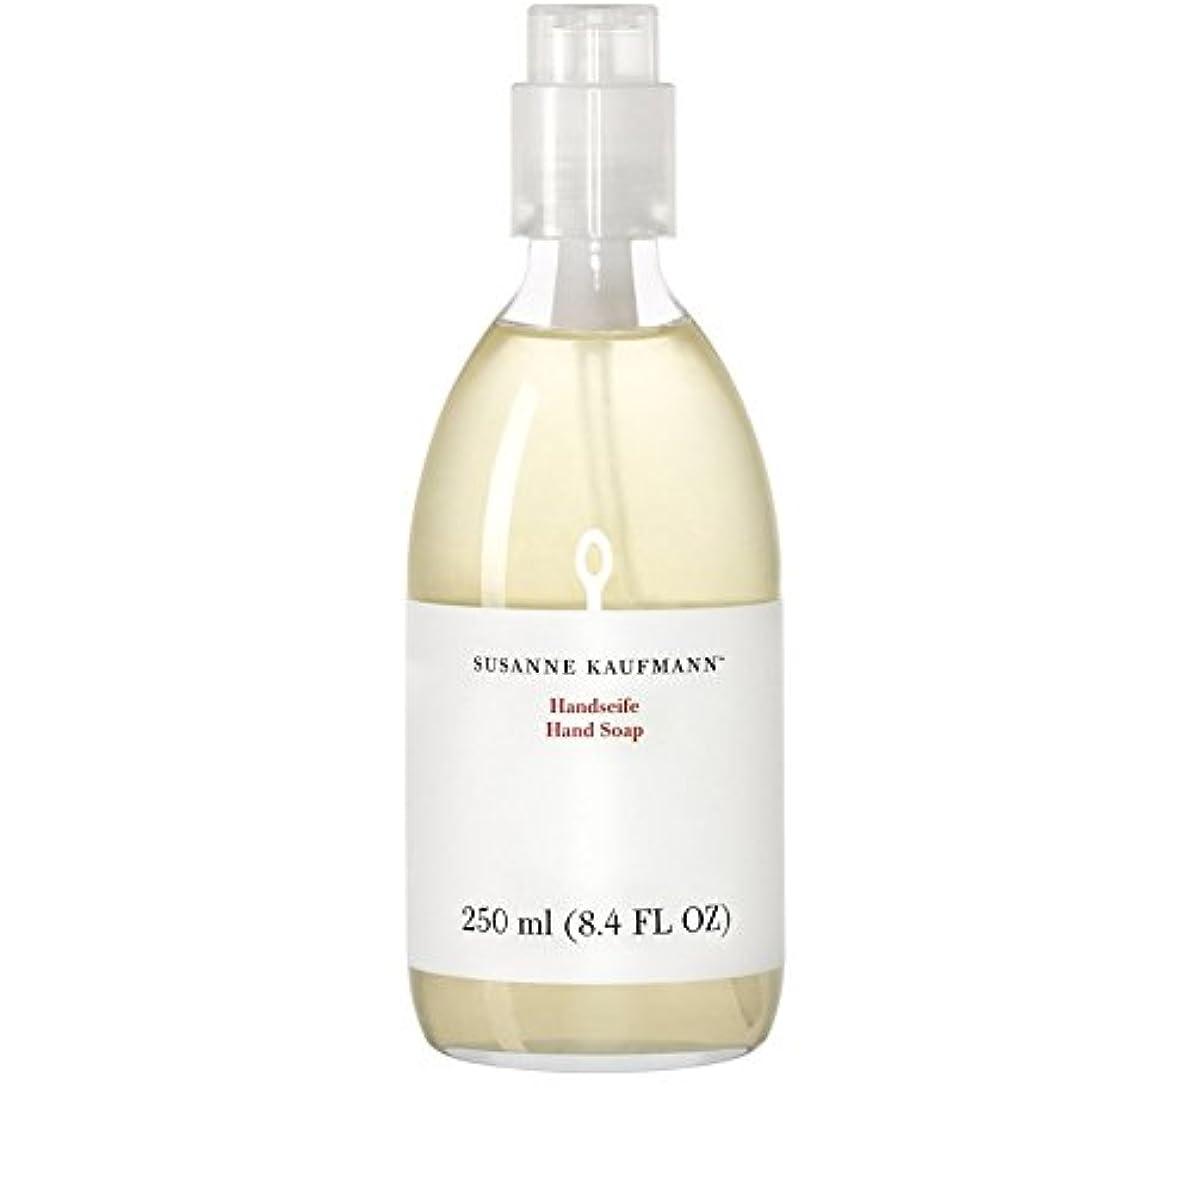 Susanne Kaufmann Hand Soap 250ml - スザンヌカウフマンハンドソープ250ミリリットル [並行輸入品]